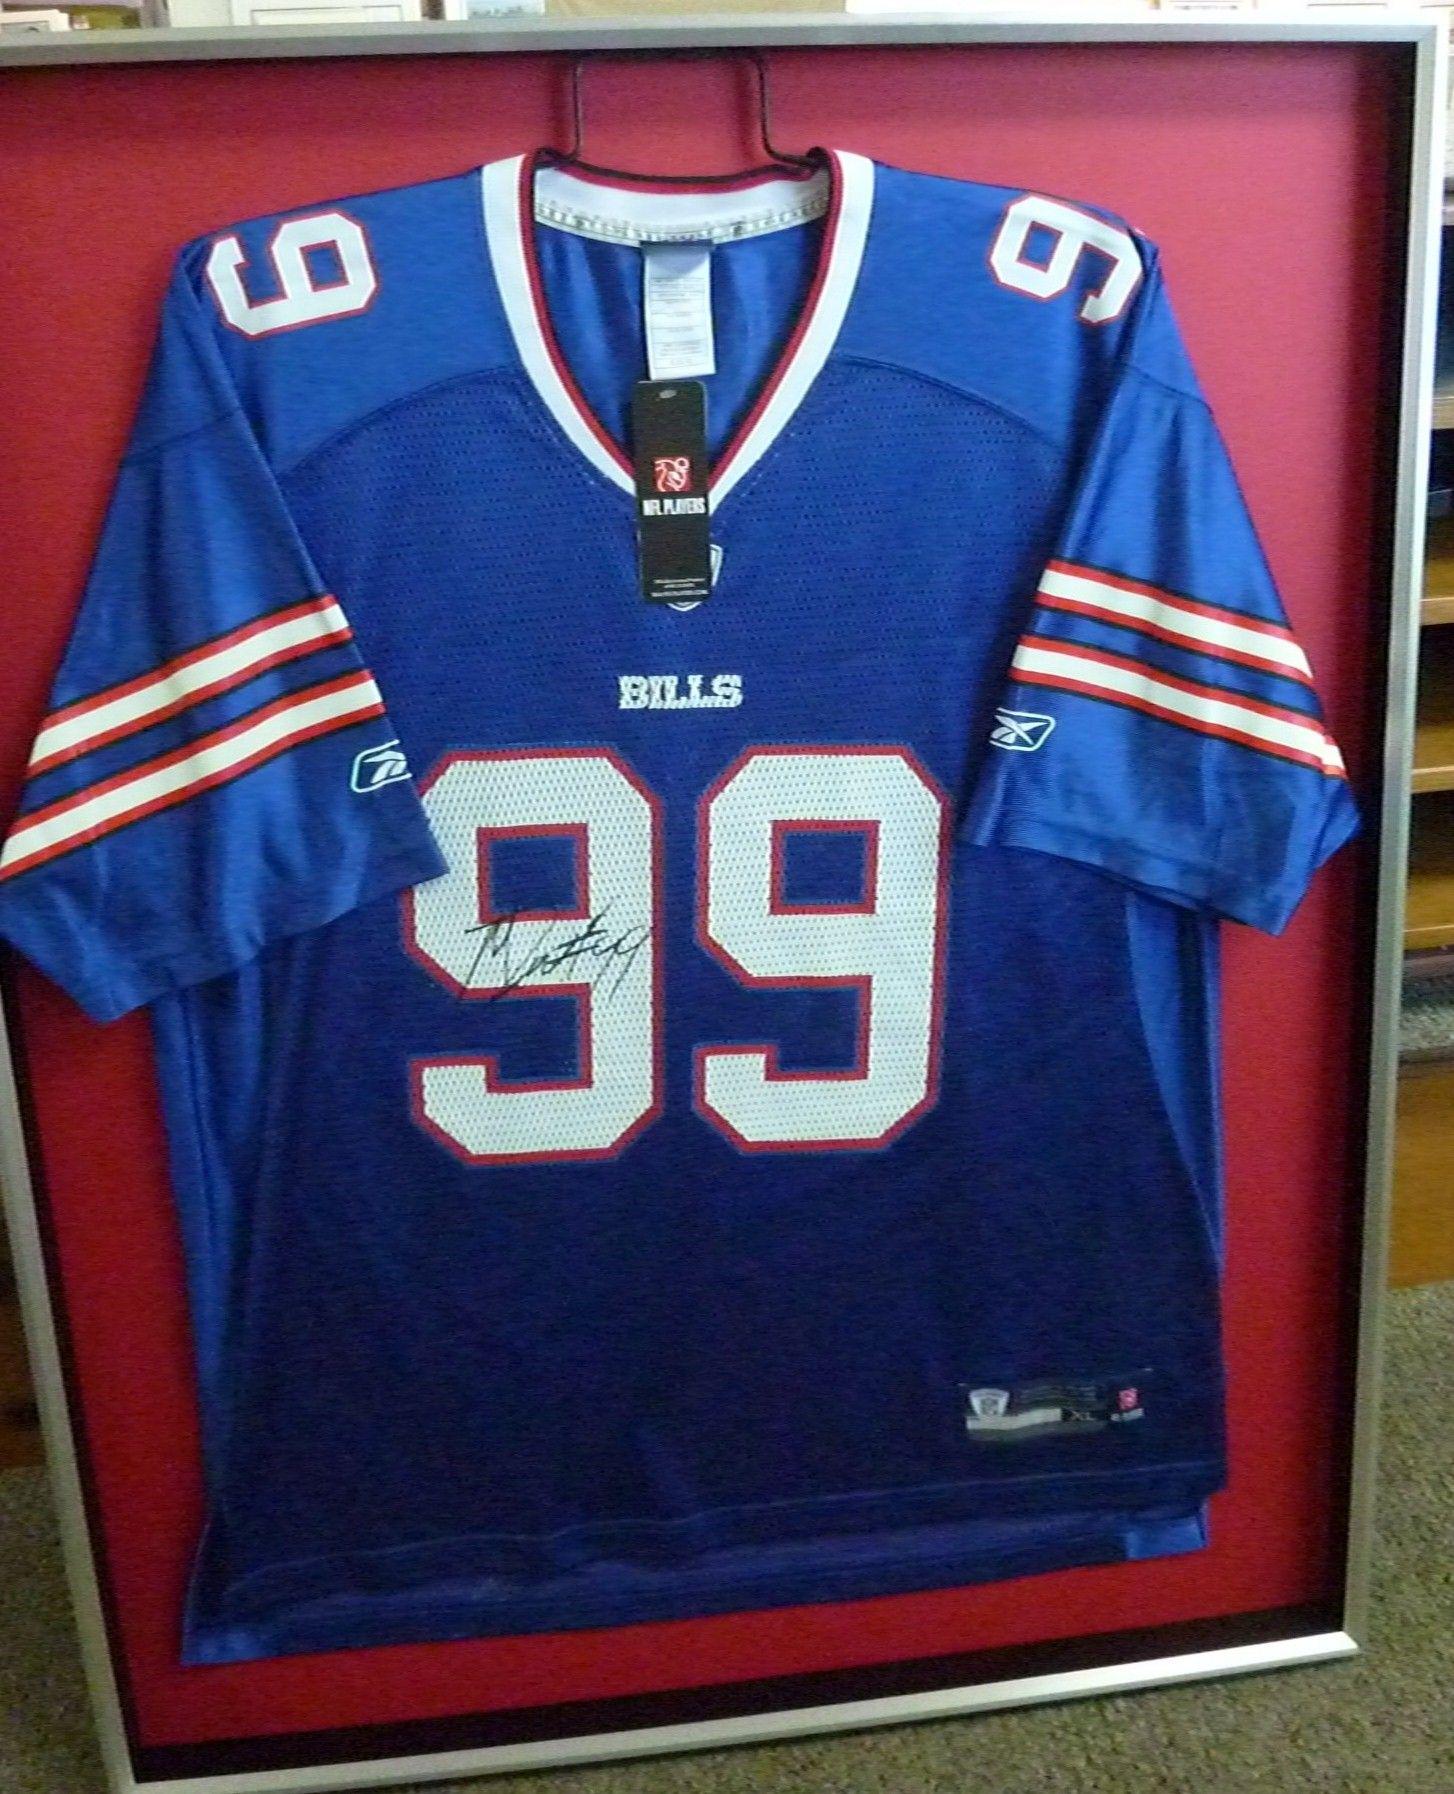 087fdb40d Autographed Buffalo Bills jersey in a display case.  buffalosports  football